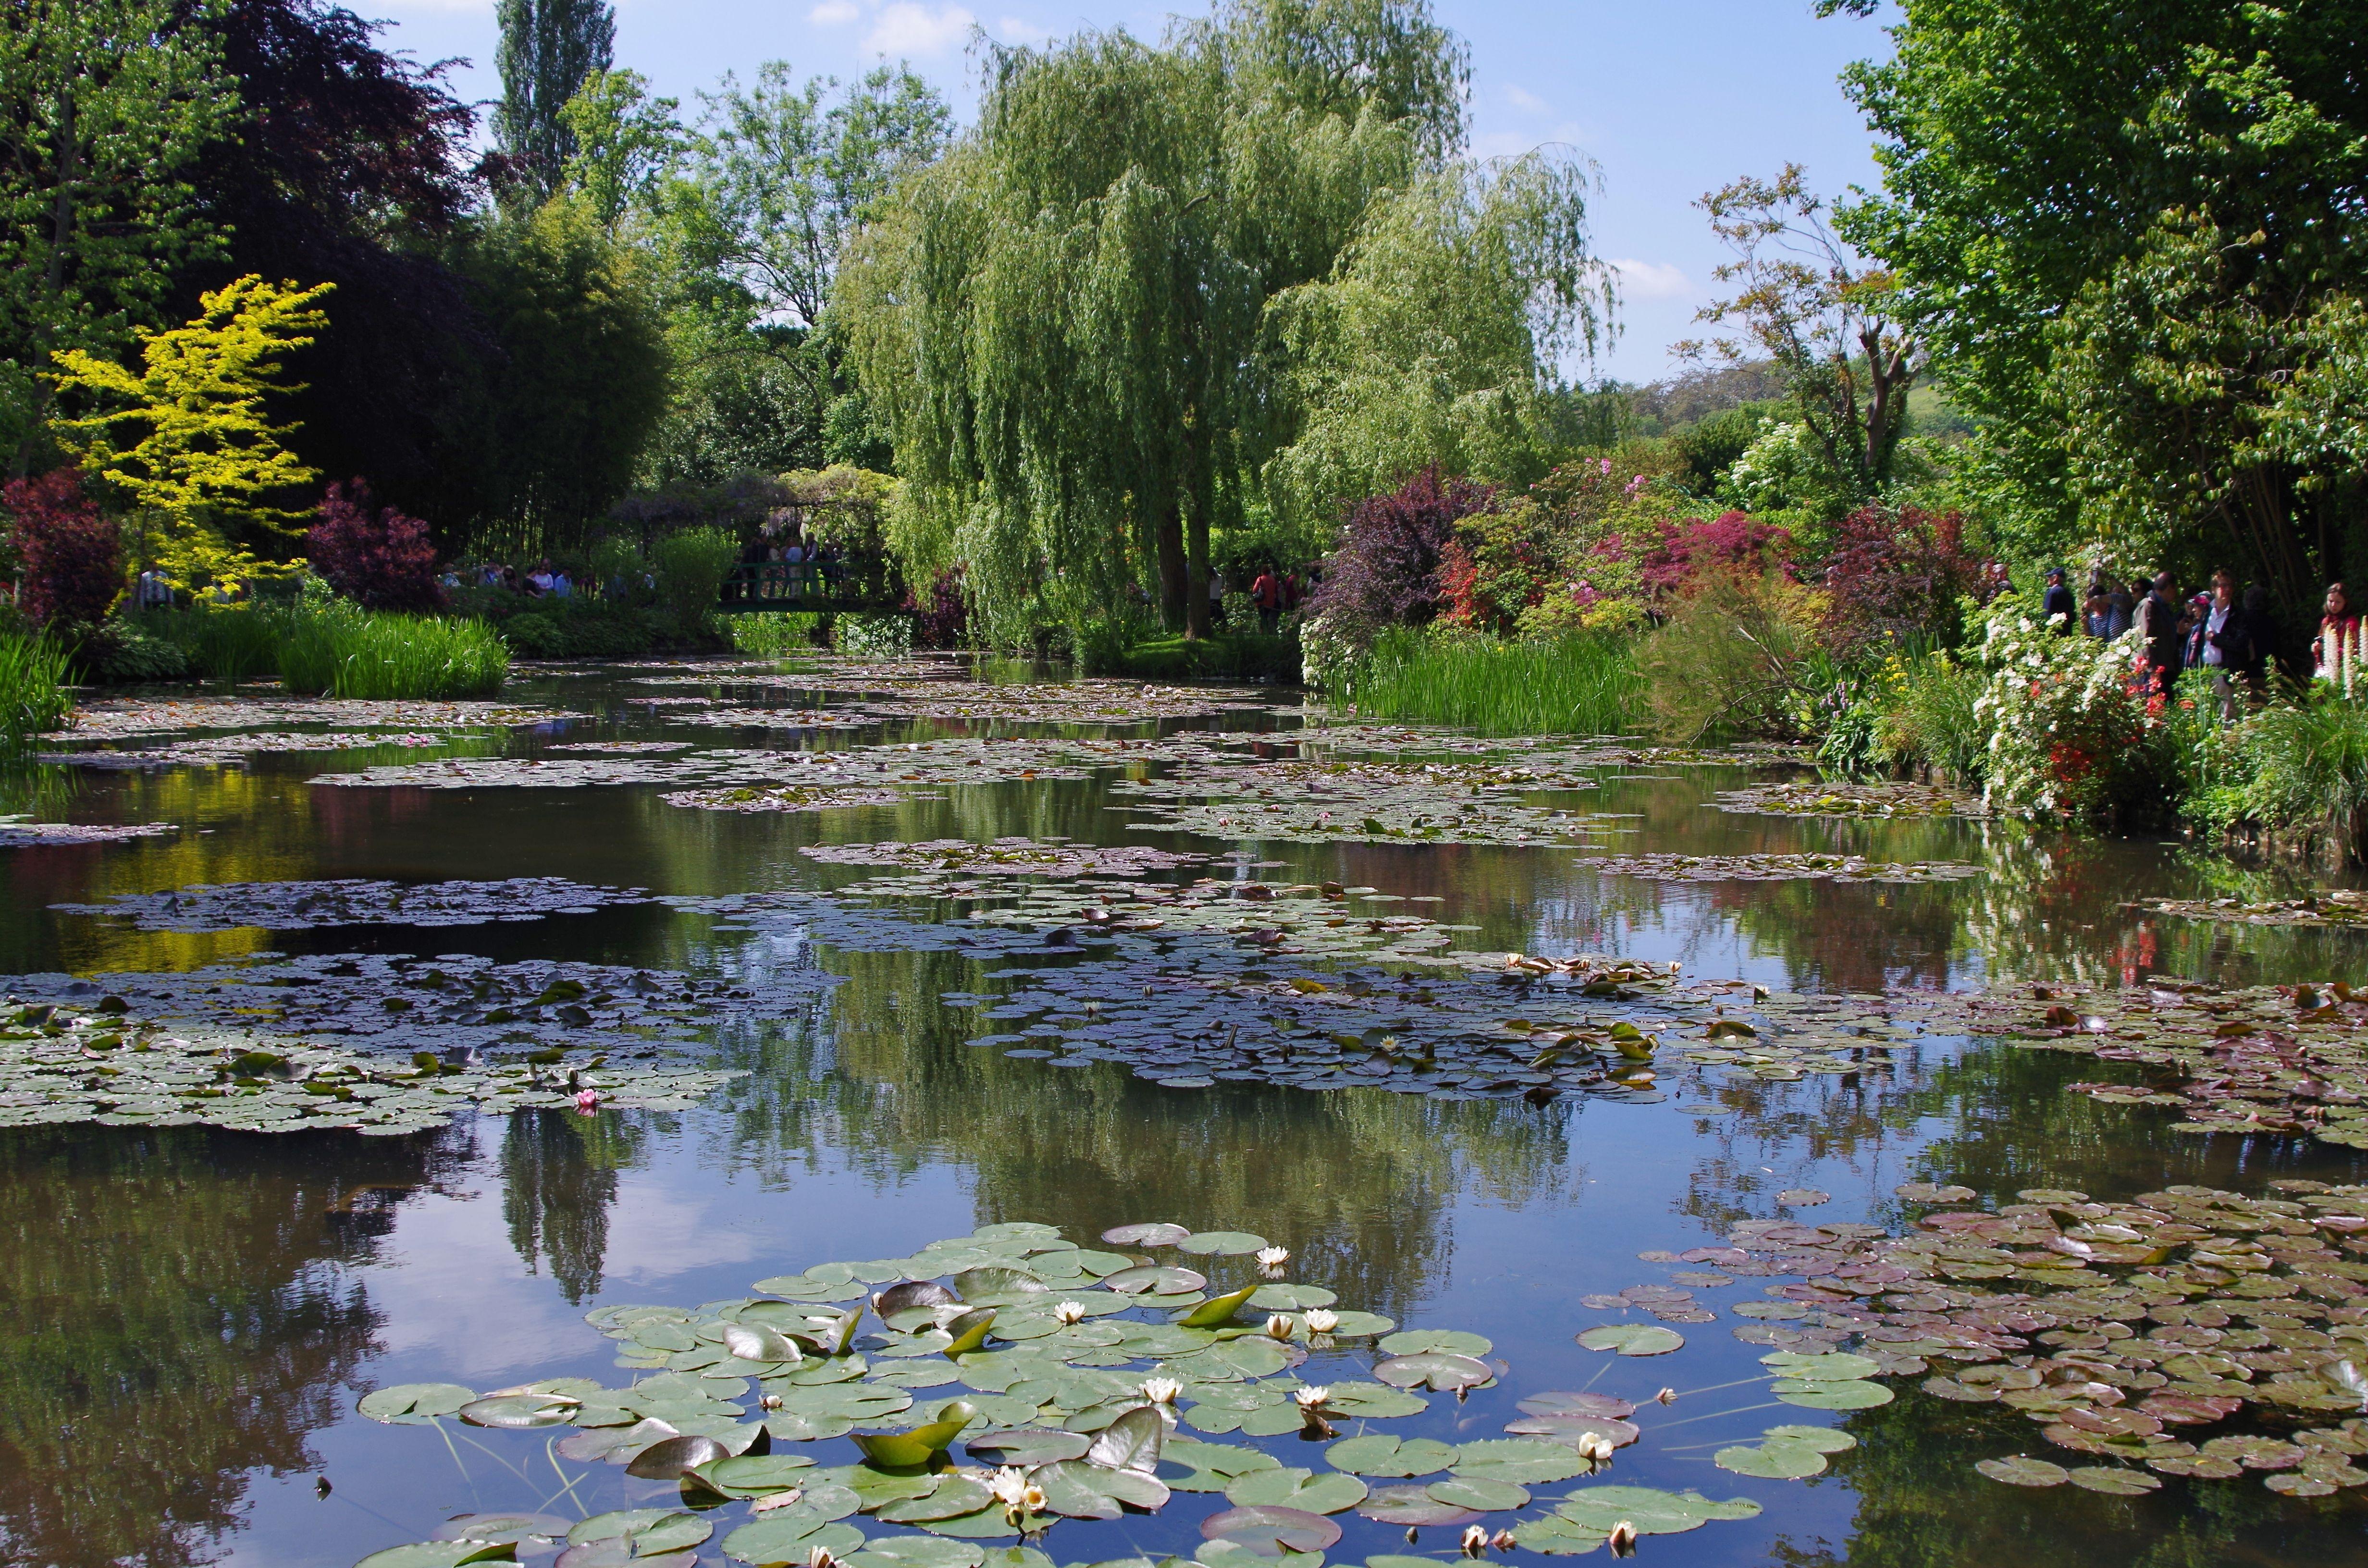 Lo stagno delle ninfee nel giardino di claude monet a giverny gardens claude monet monet e - Giardino delle ninfee ...